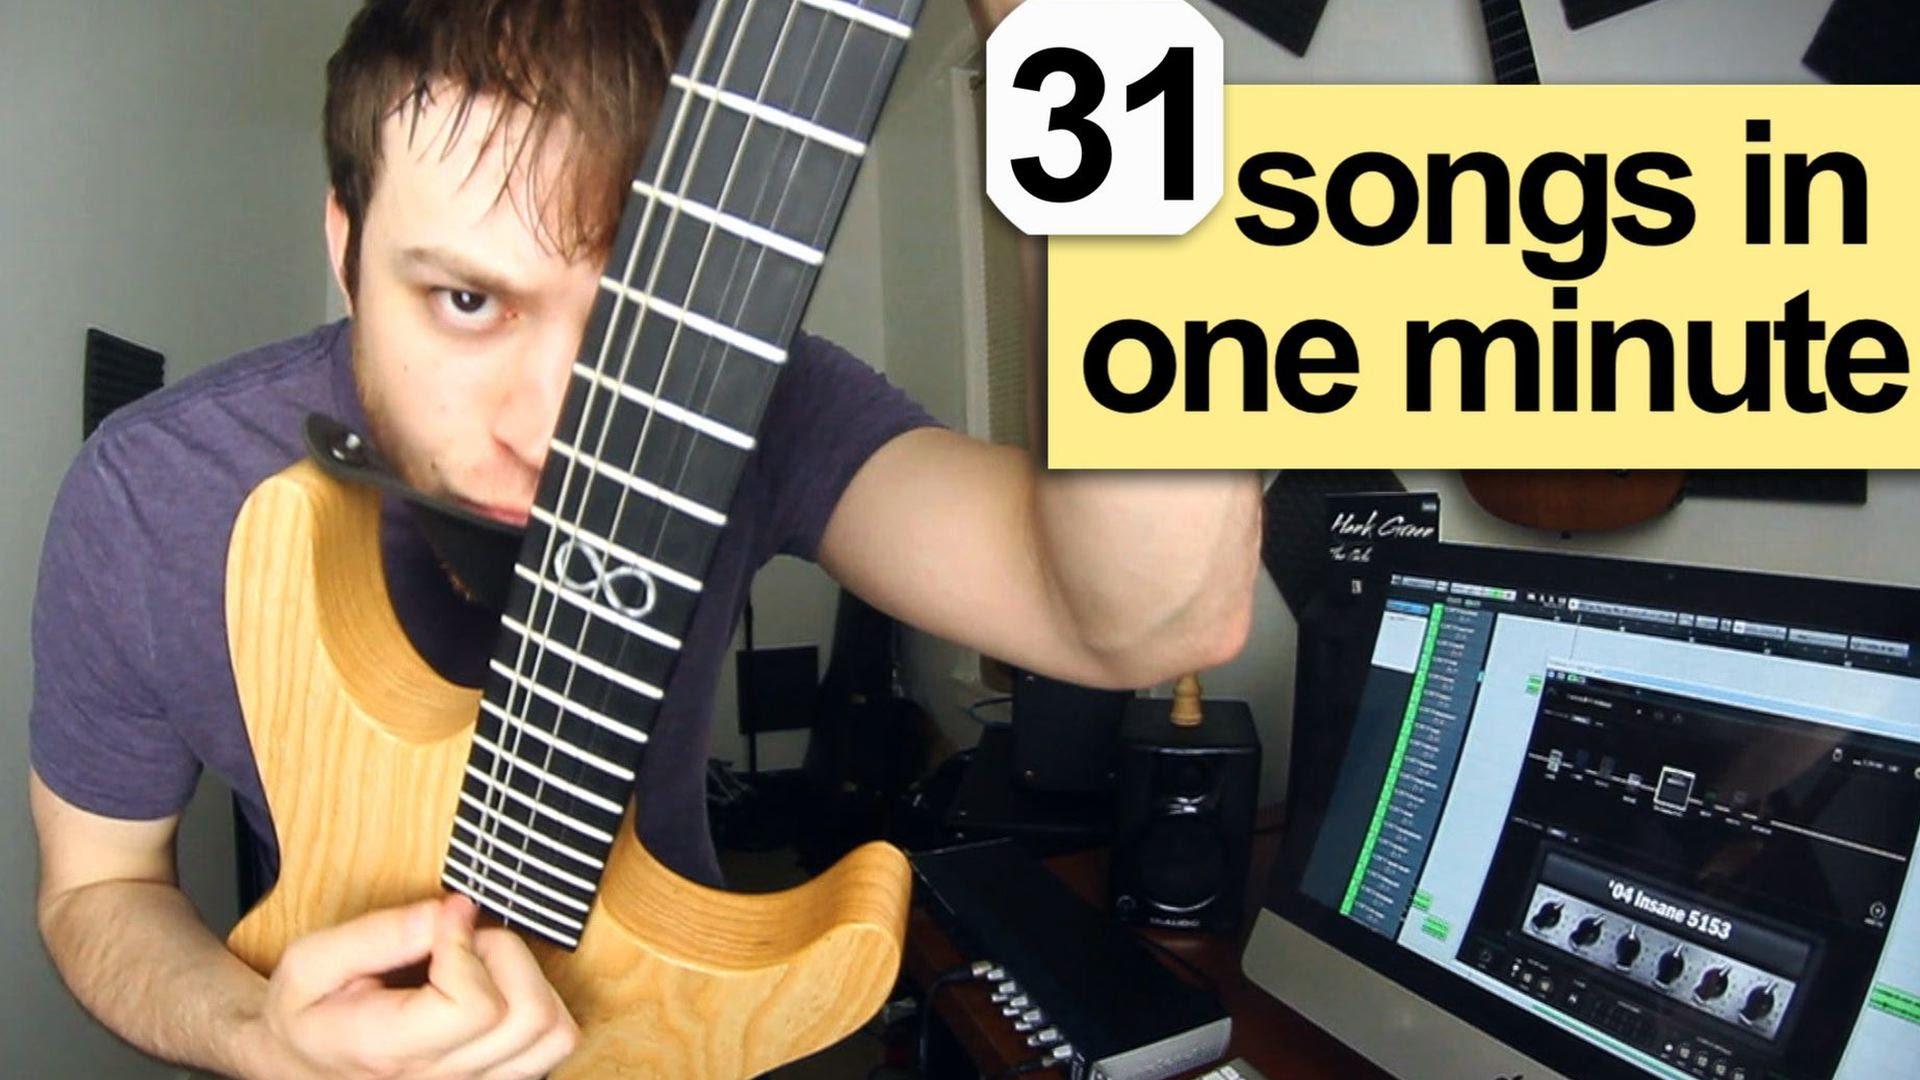 31 songů v jedné minutě – to je frajer!